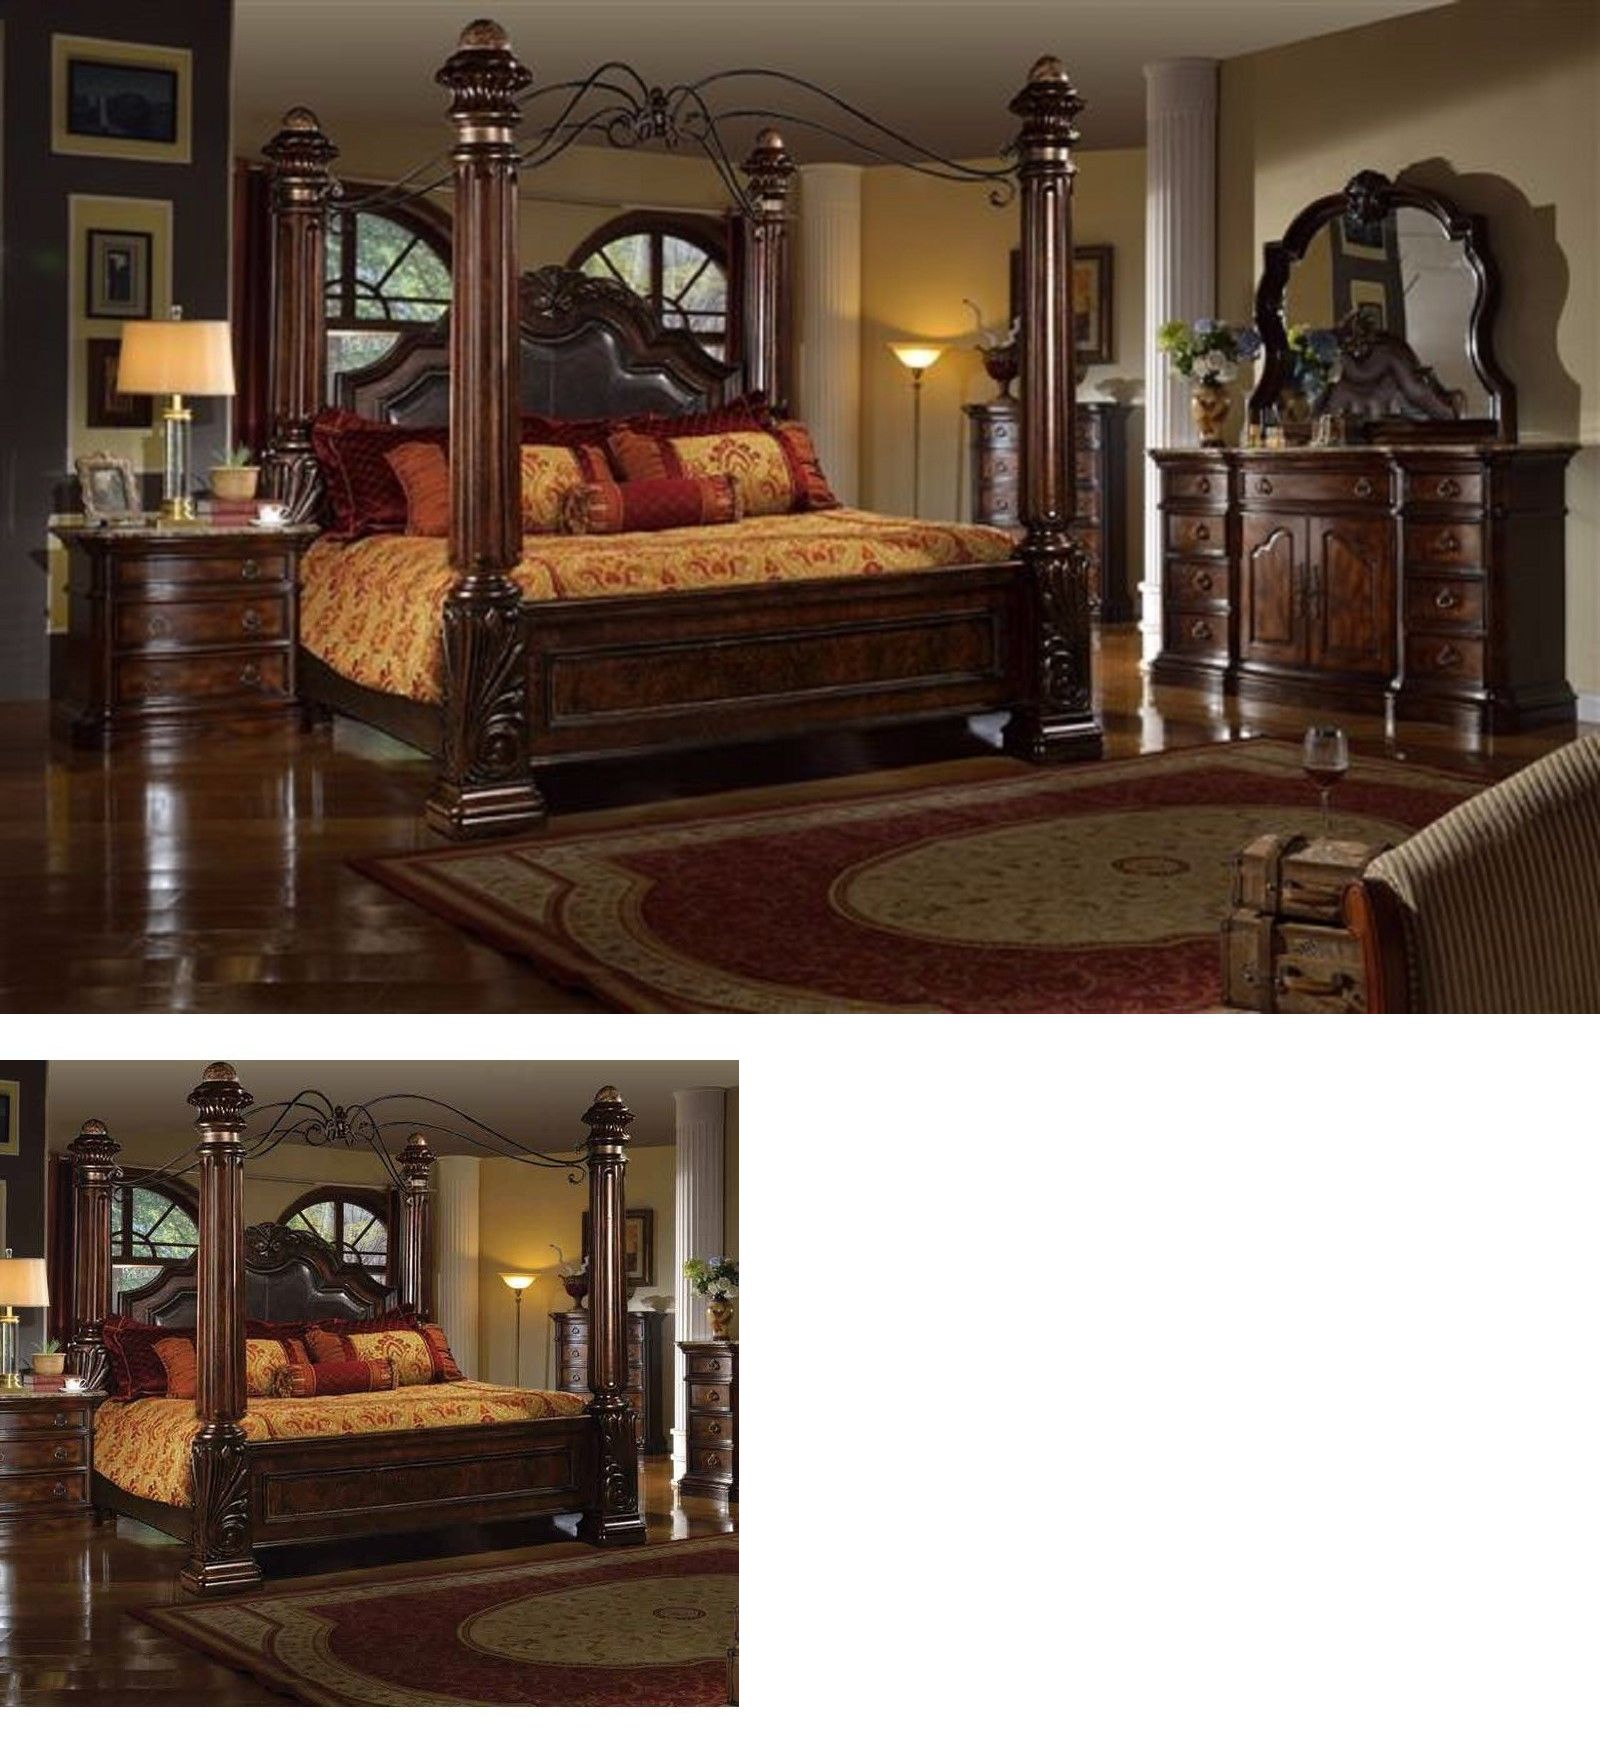 Bedding Mcferran Rb6003 Tuscan Leather Eastern King Size Bedroom